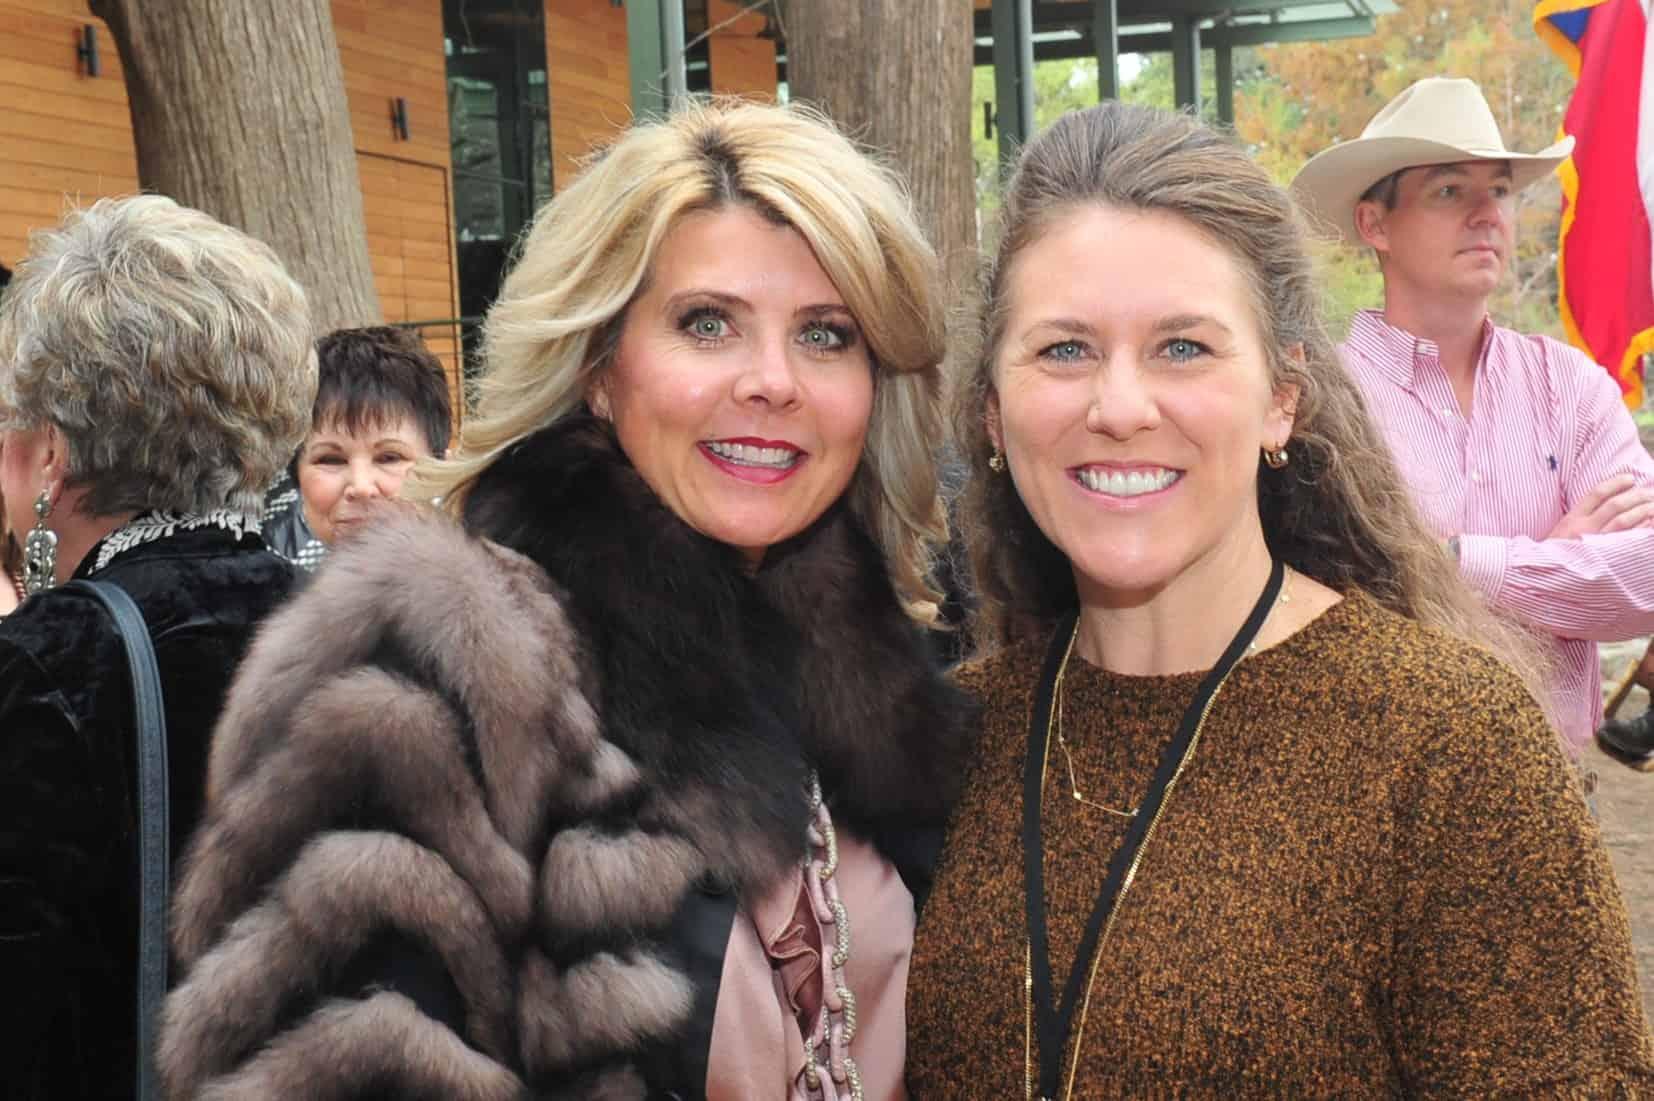 Laura Jane Elder and Jessica Erin Elliott